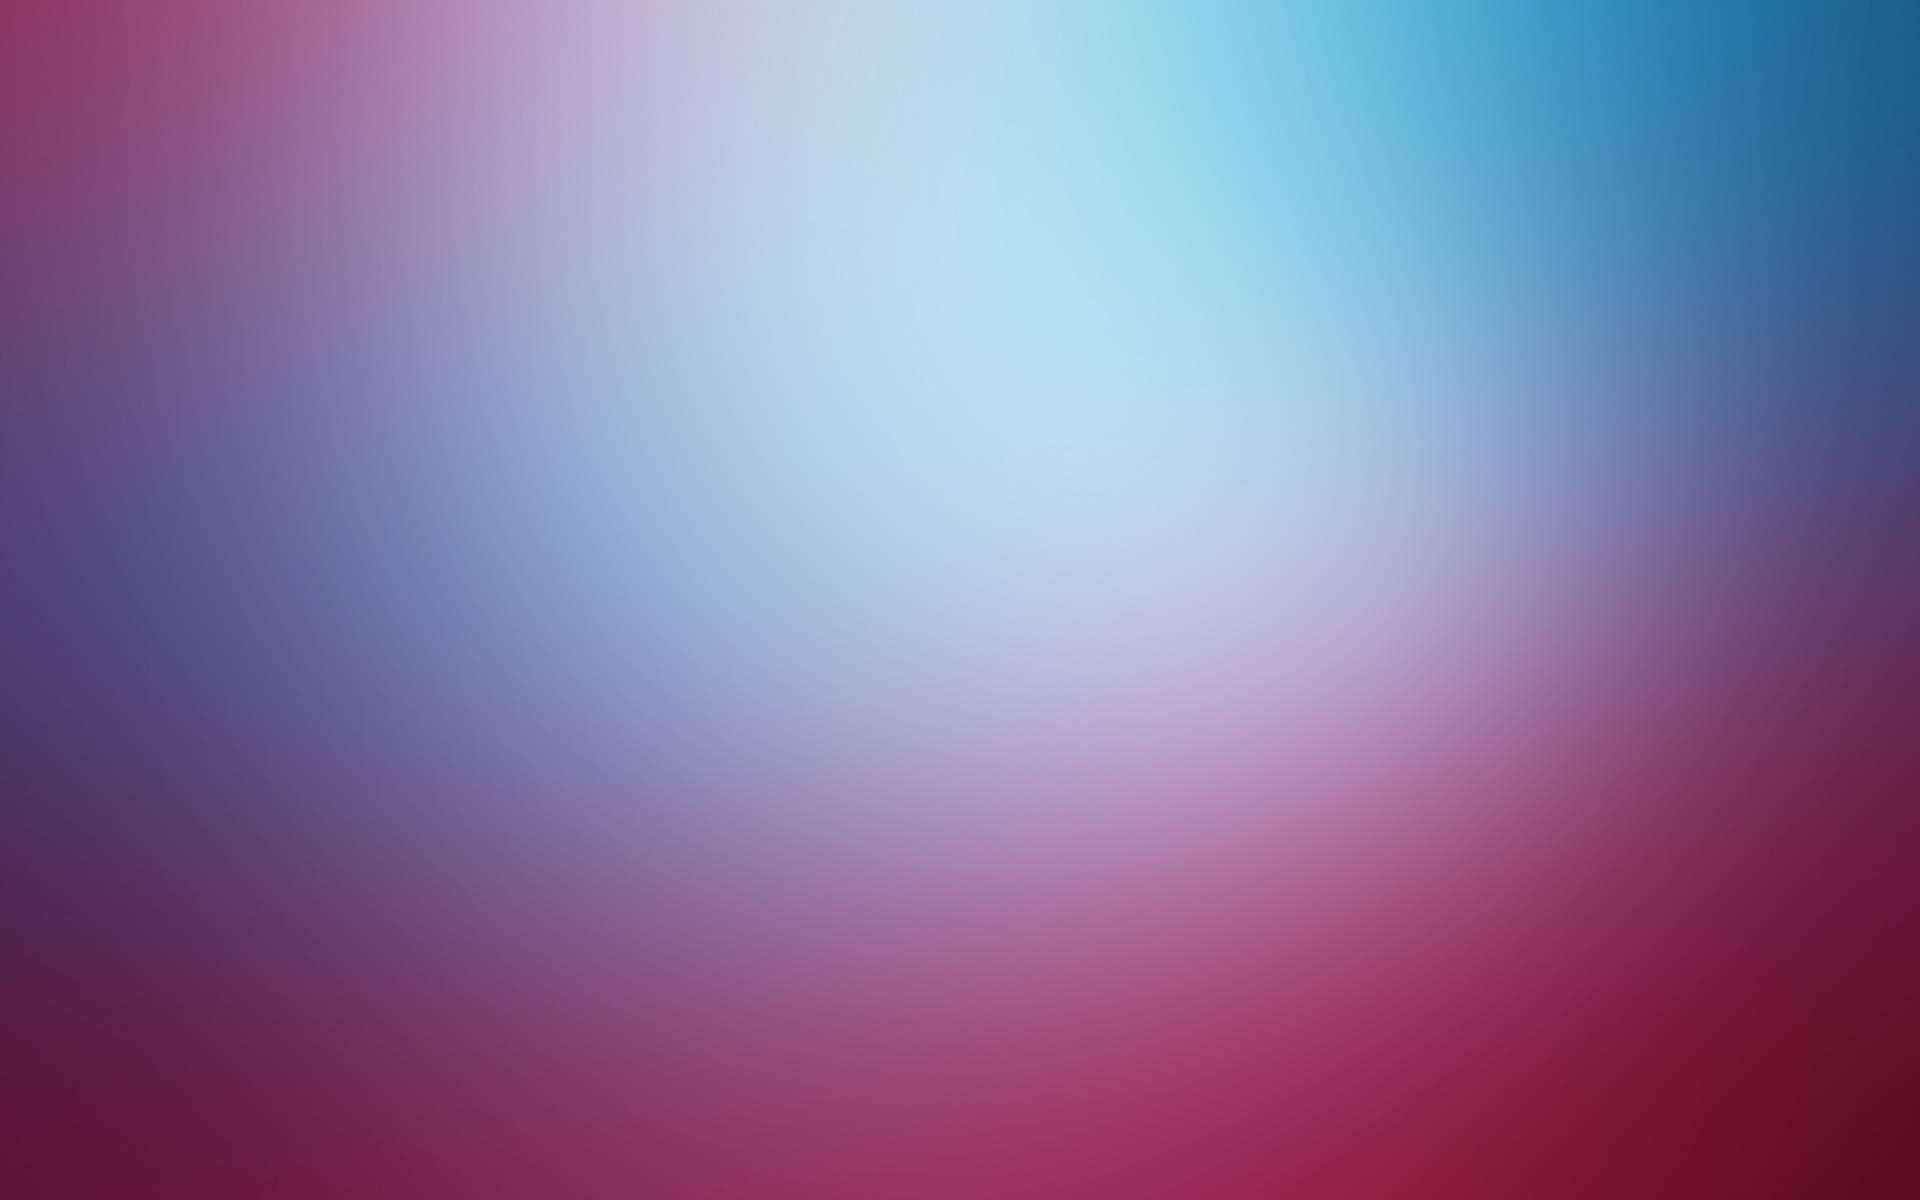 bailey skye / nightspace (@nightspace) Cover Image